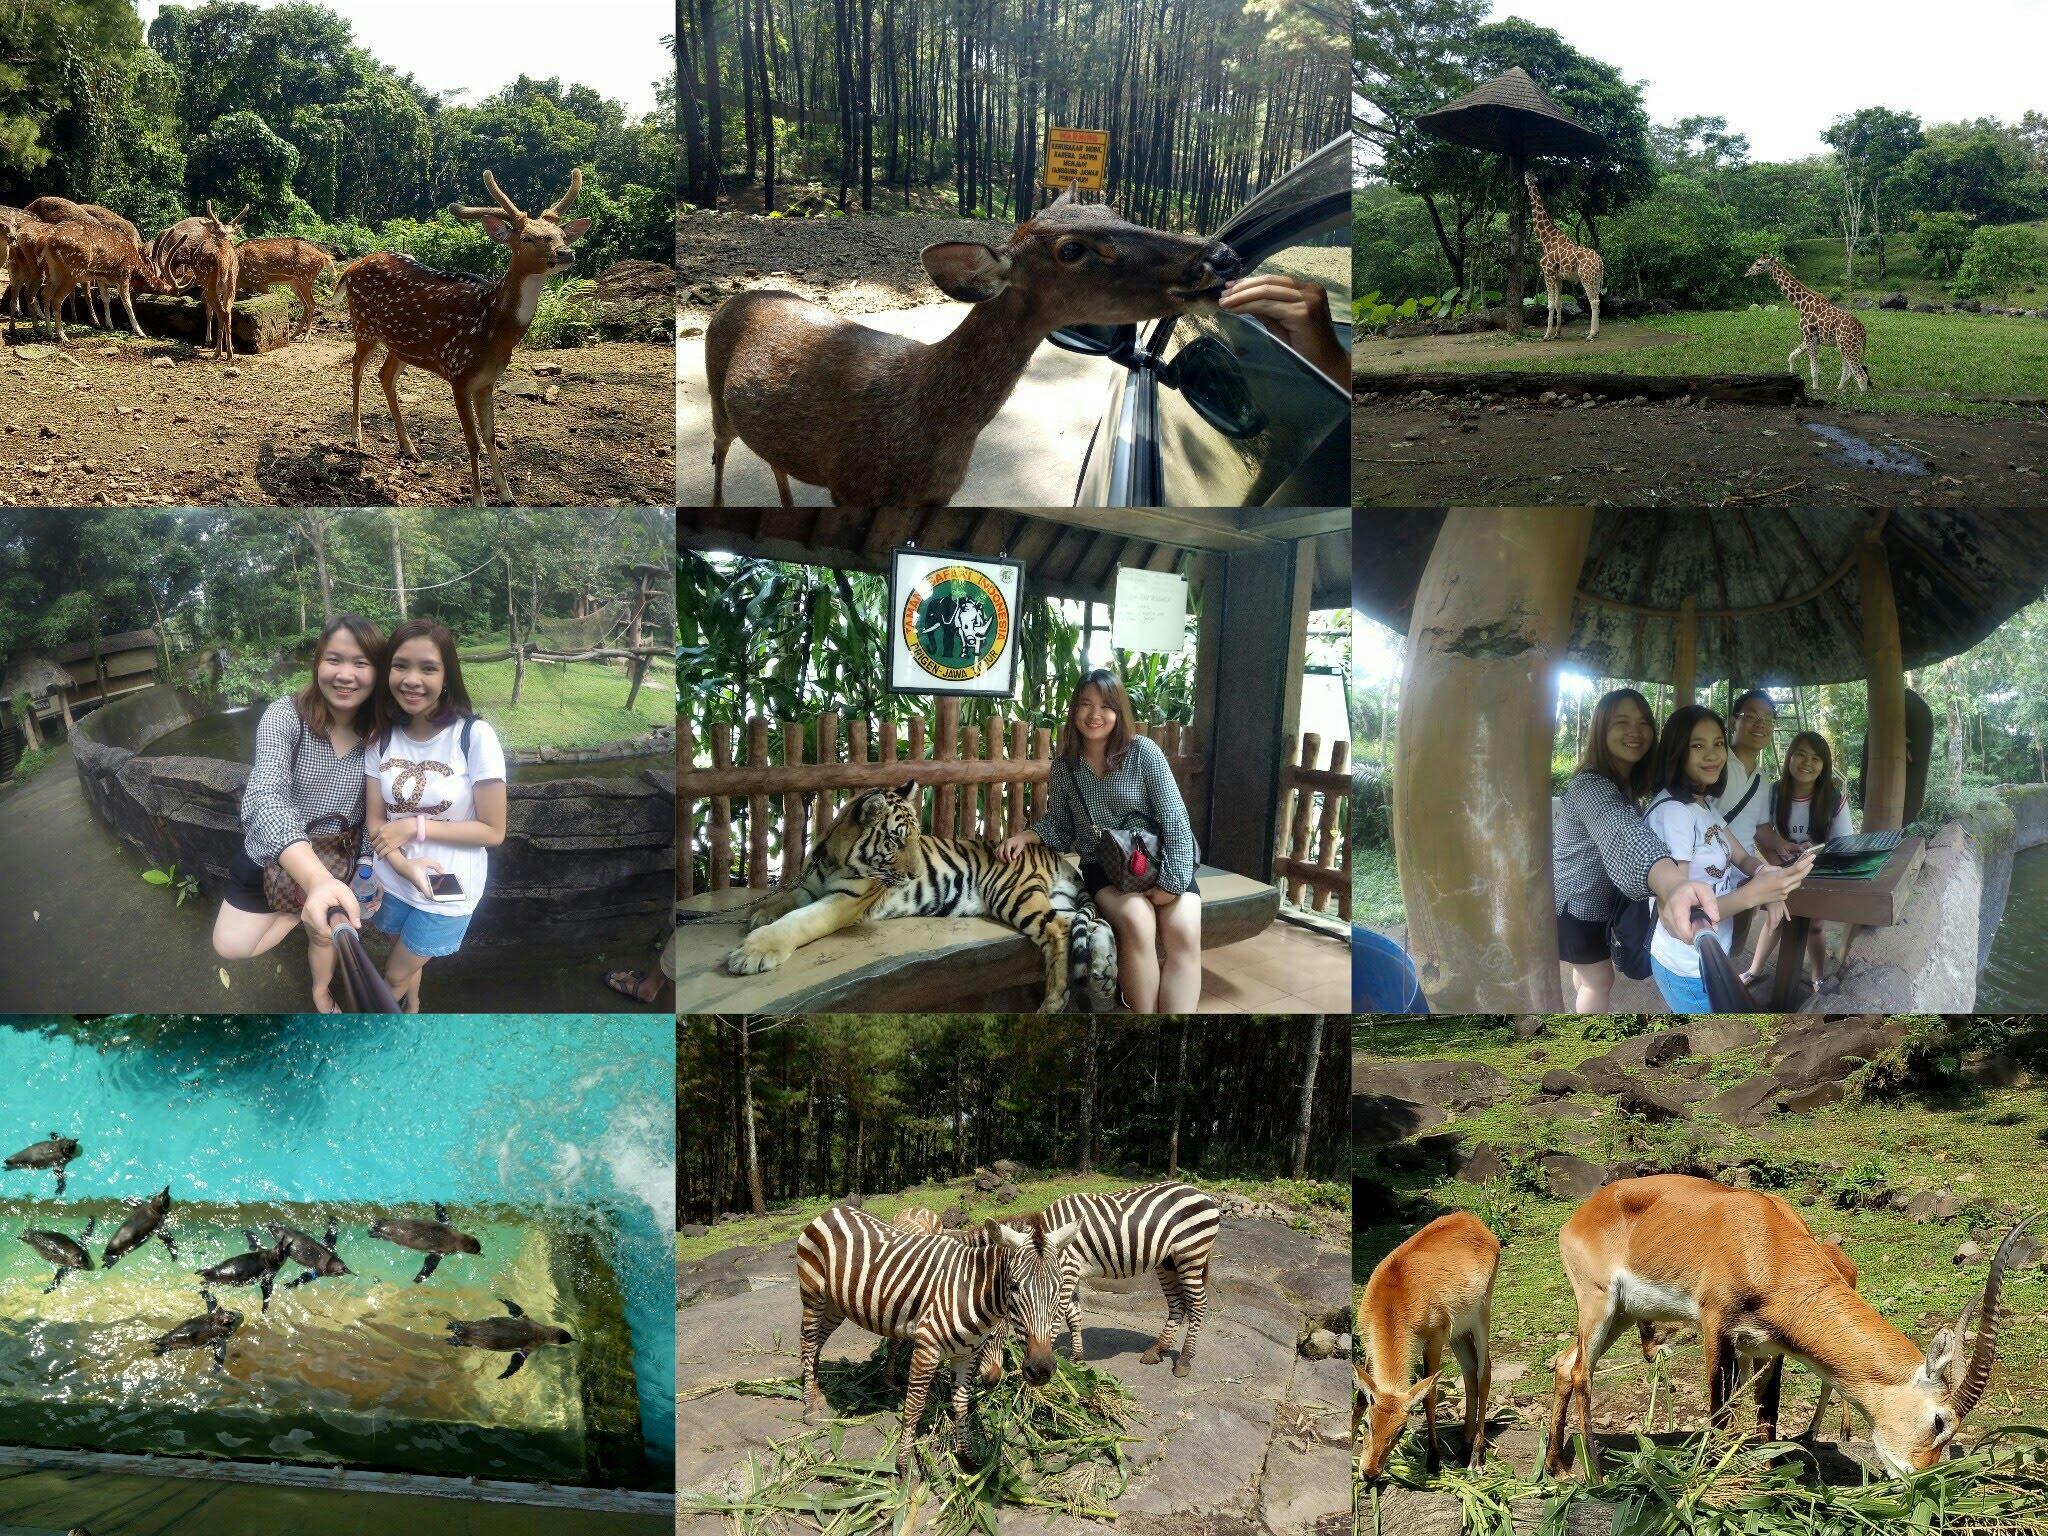 Taman Safari Prigen Pasuruan Jawa Timur Vlog02 Youtube Indonesia 2